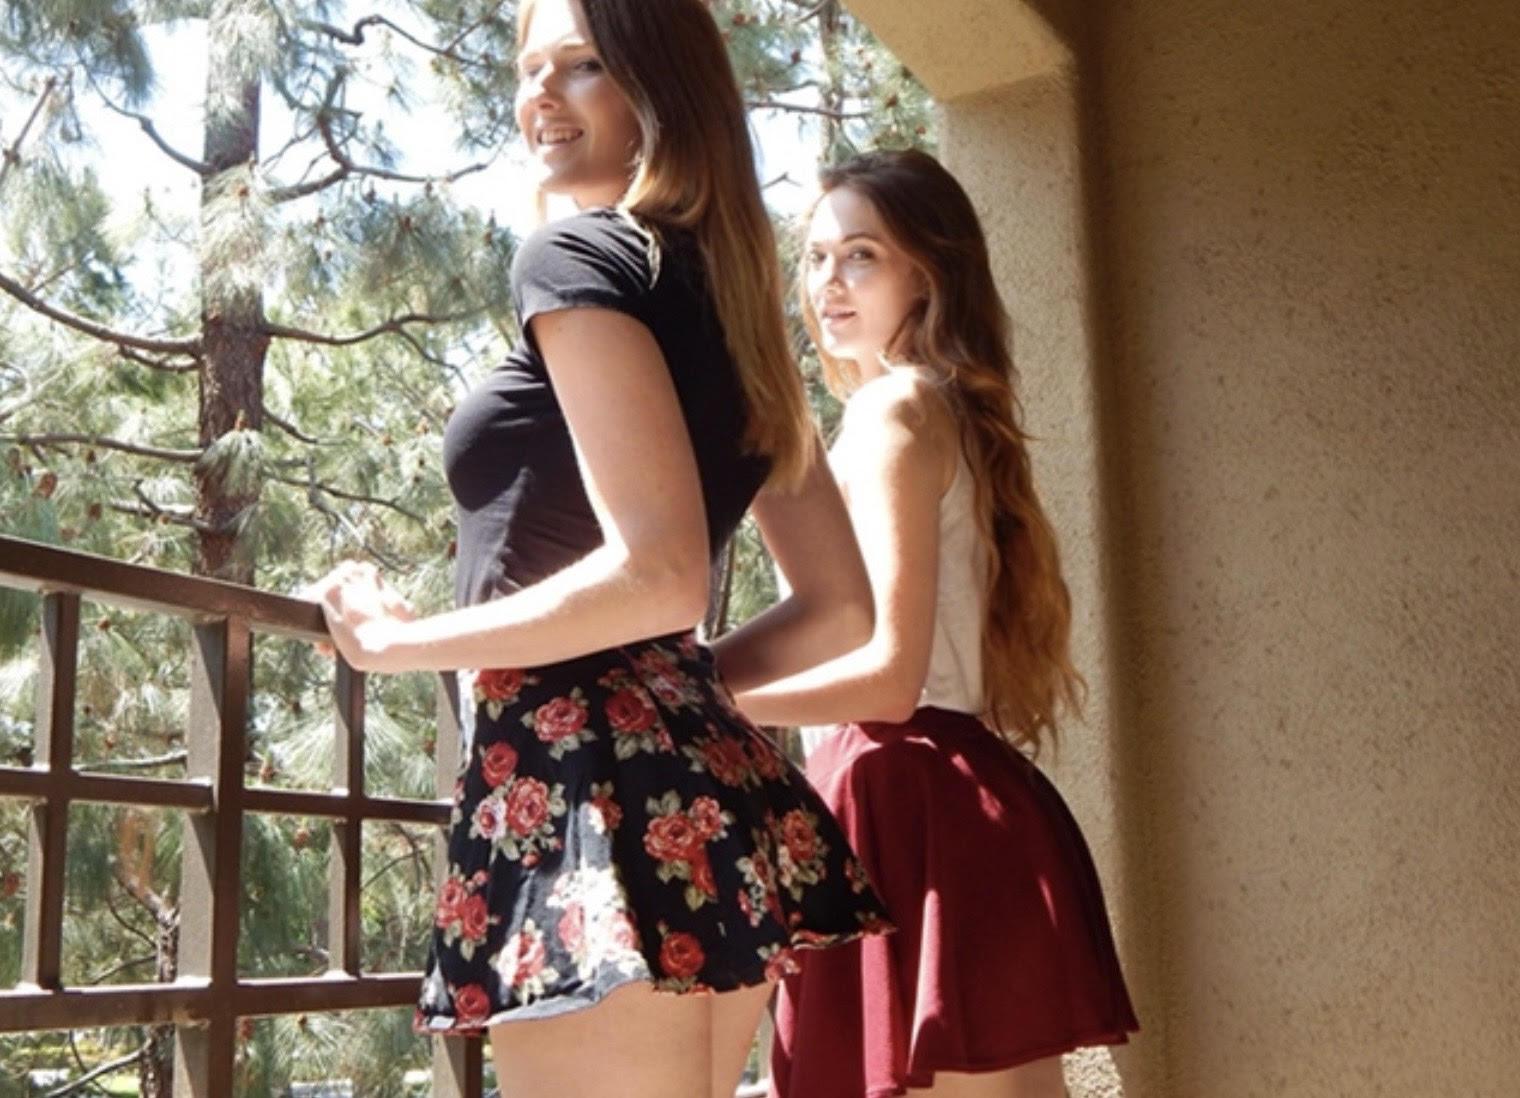 "alt=""Lesbian pornstars wearing shorts dresses"">"